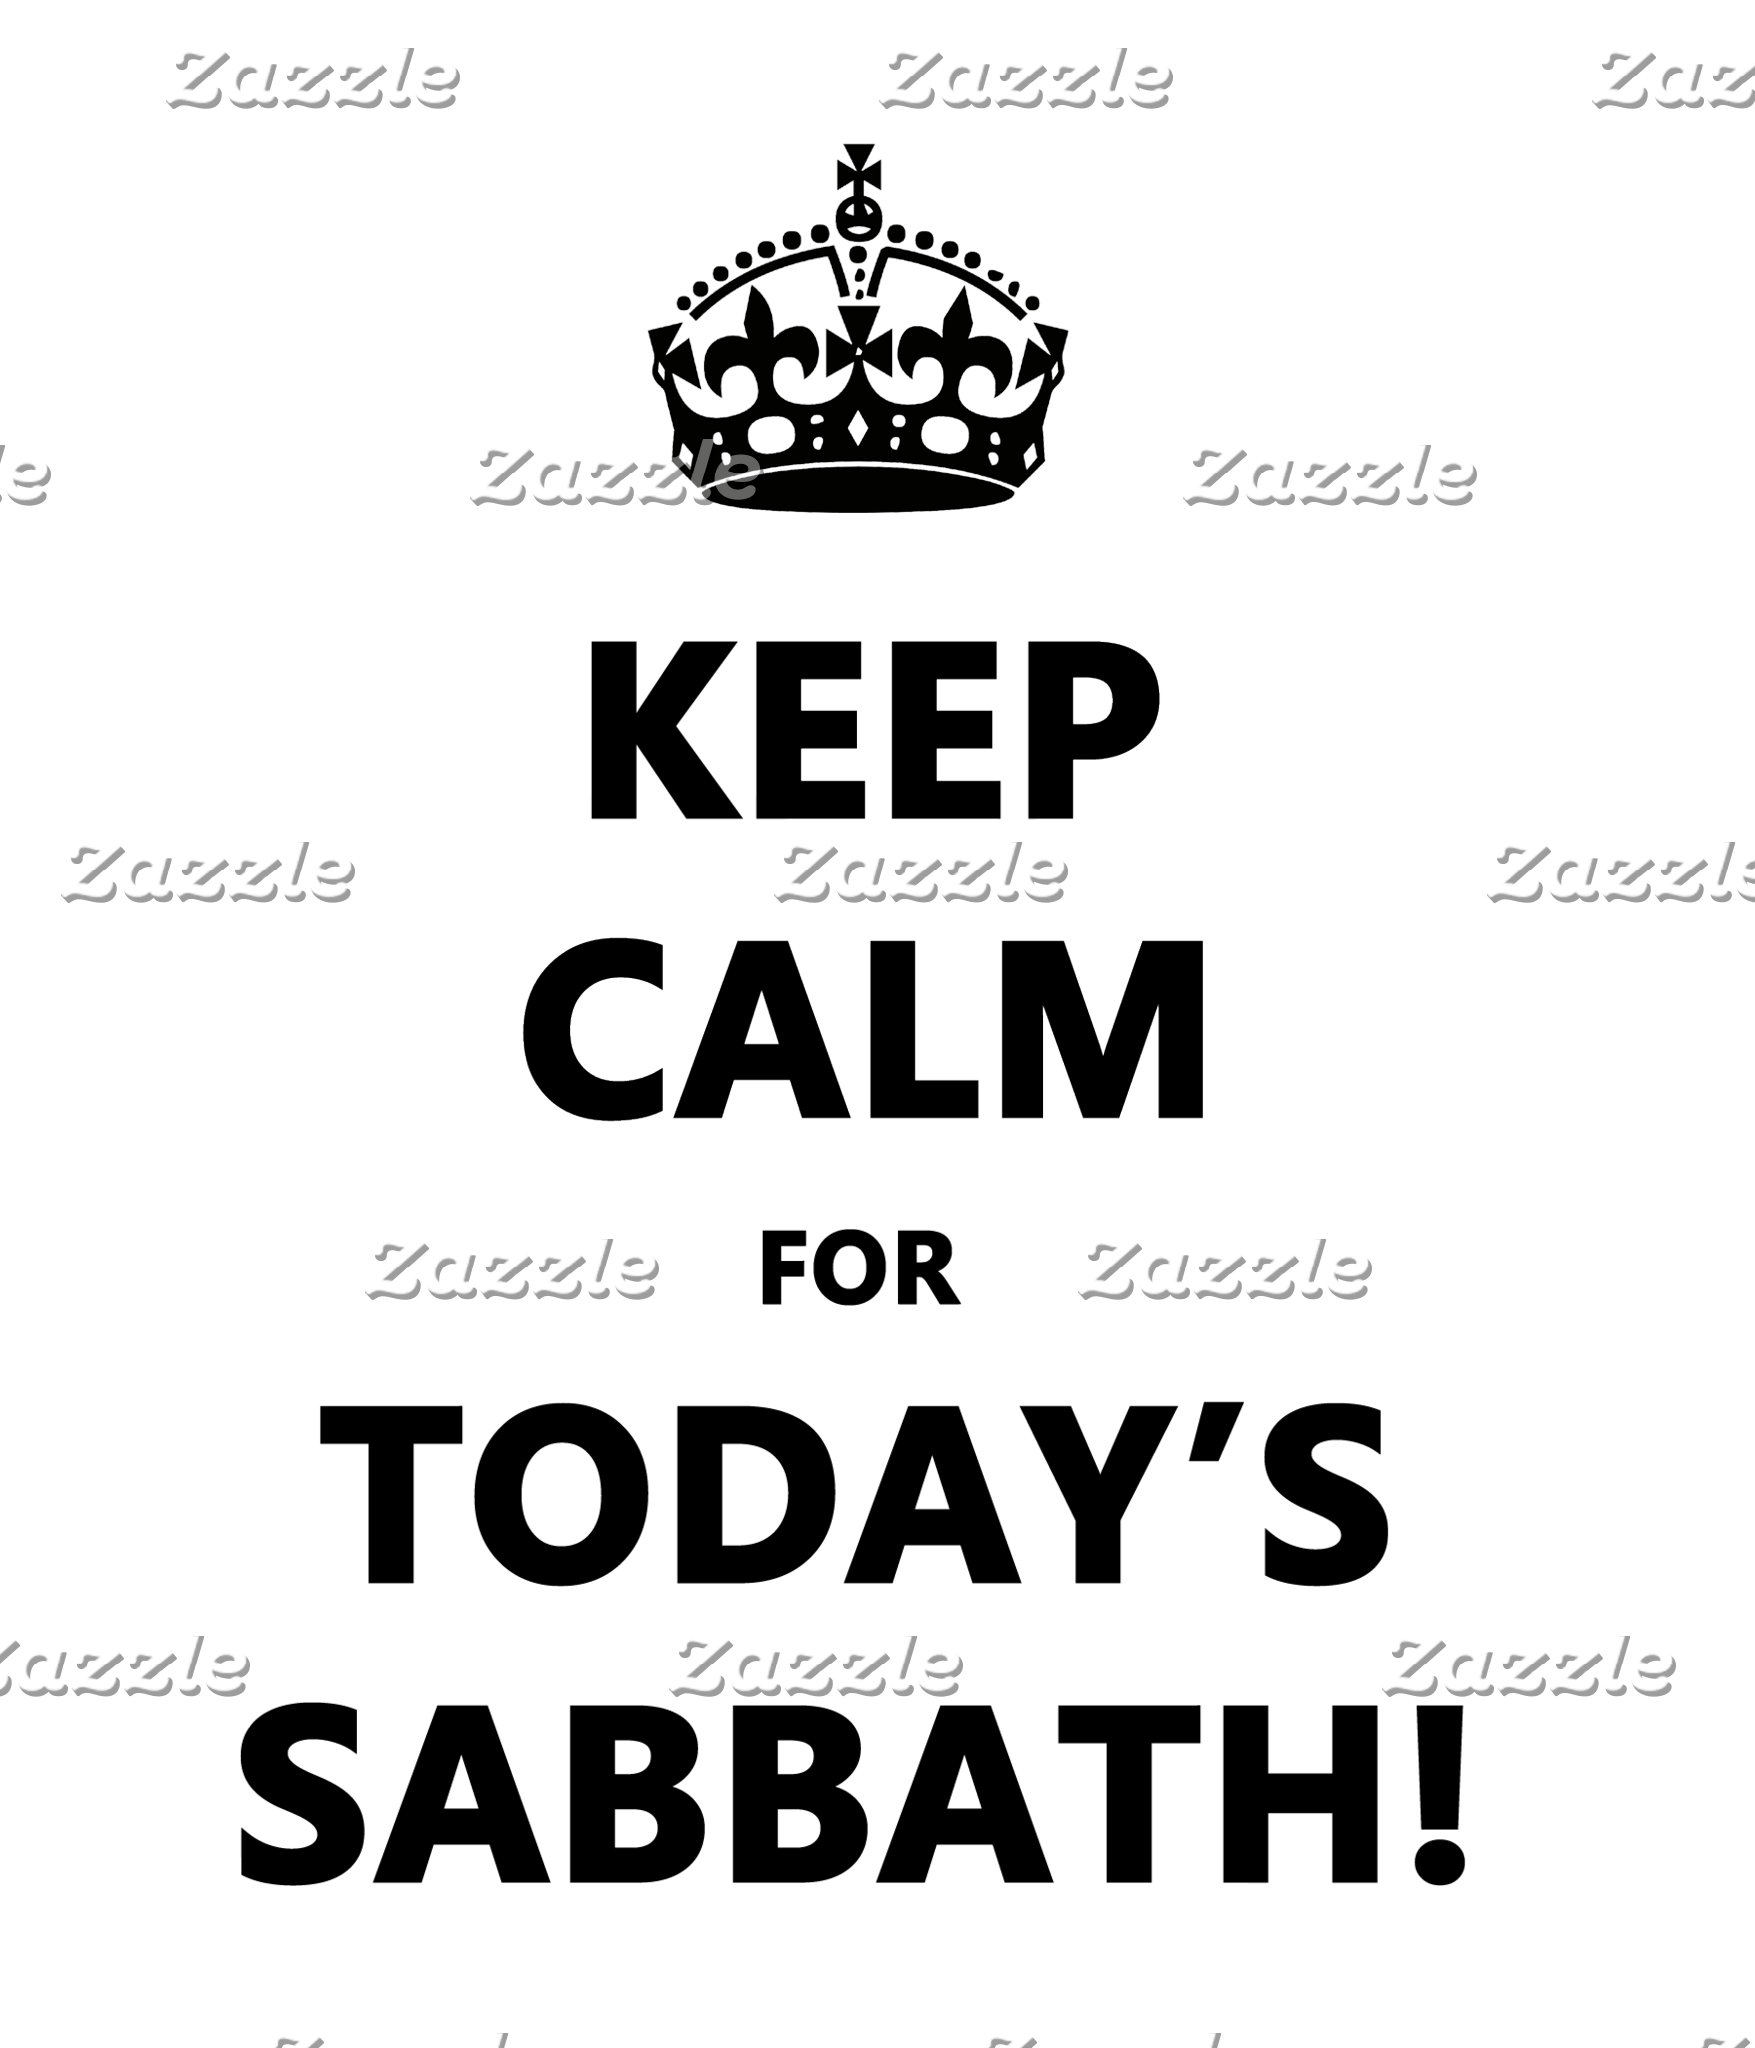 KEEP CALM for TODAY'S SABBATH